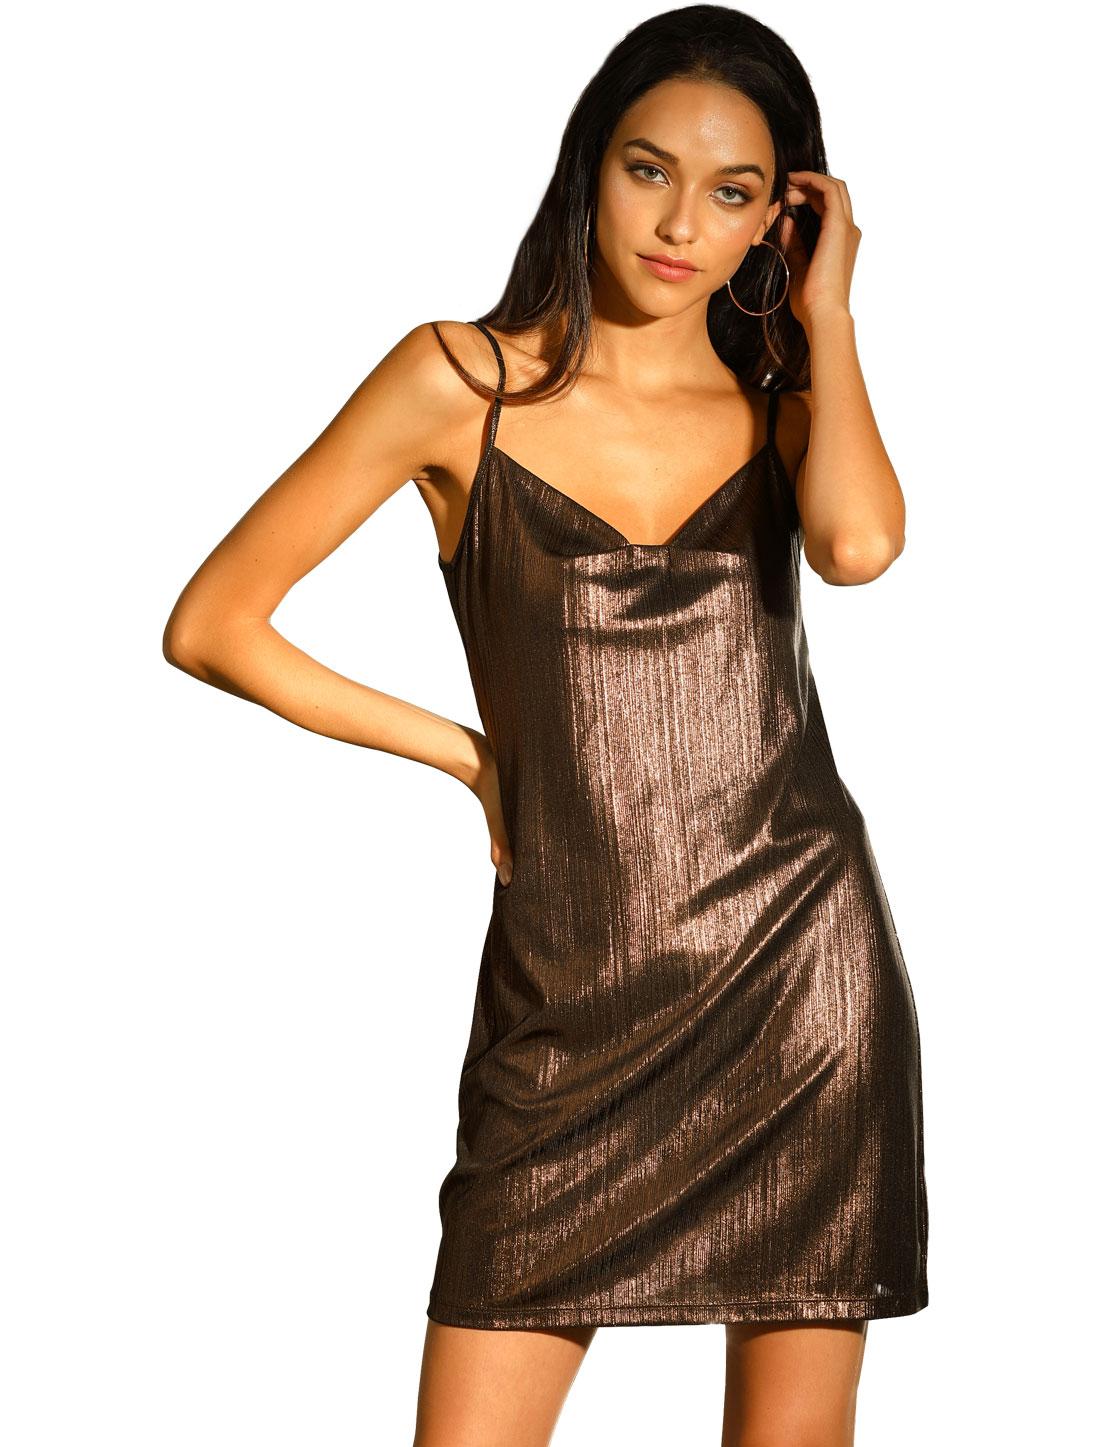 Allegra K Women's Sparkly Glitter Spaghetti Strap Party Dress Coffee Brown XS